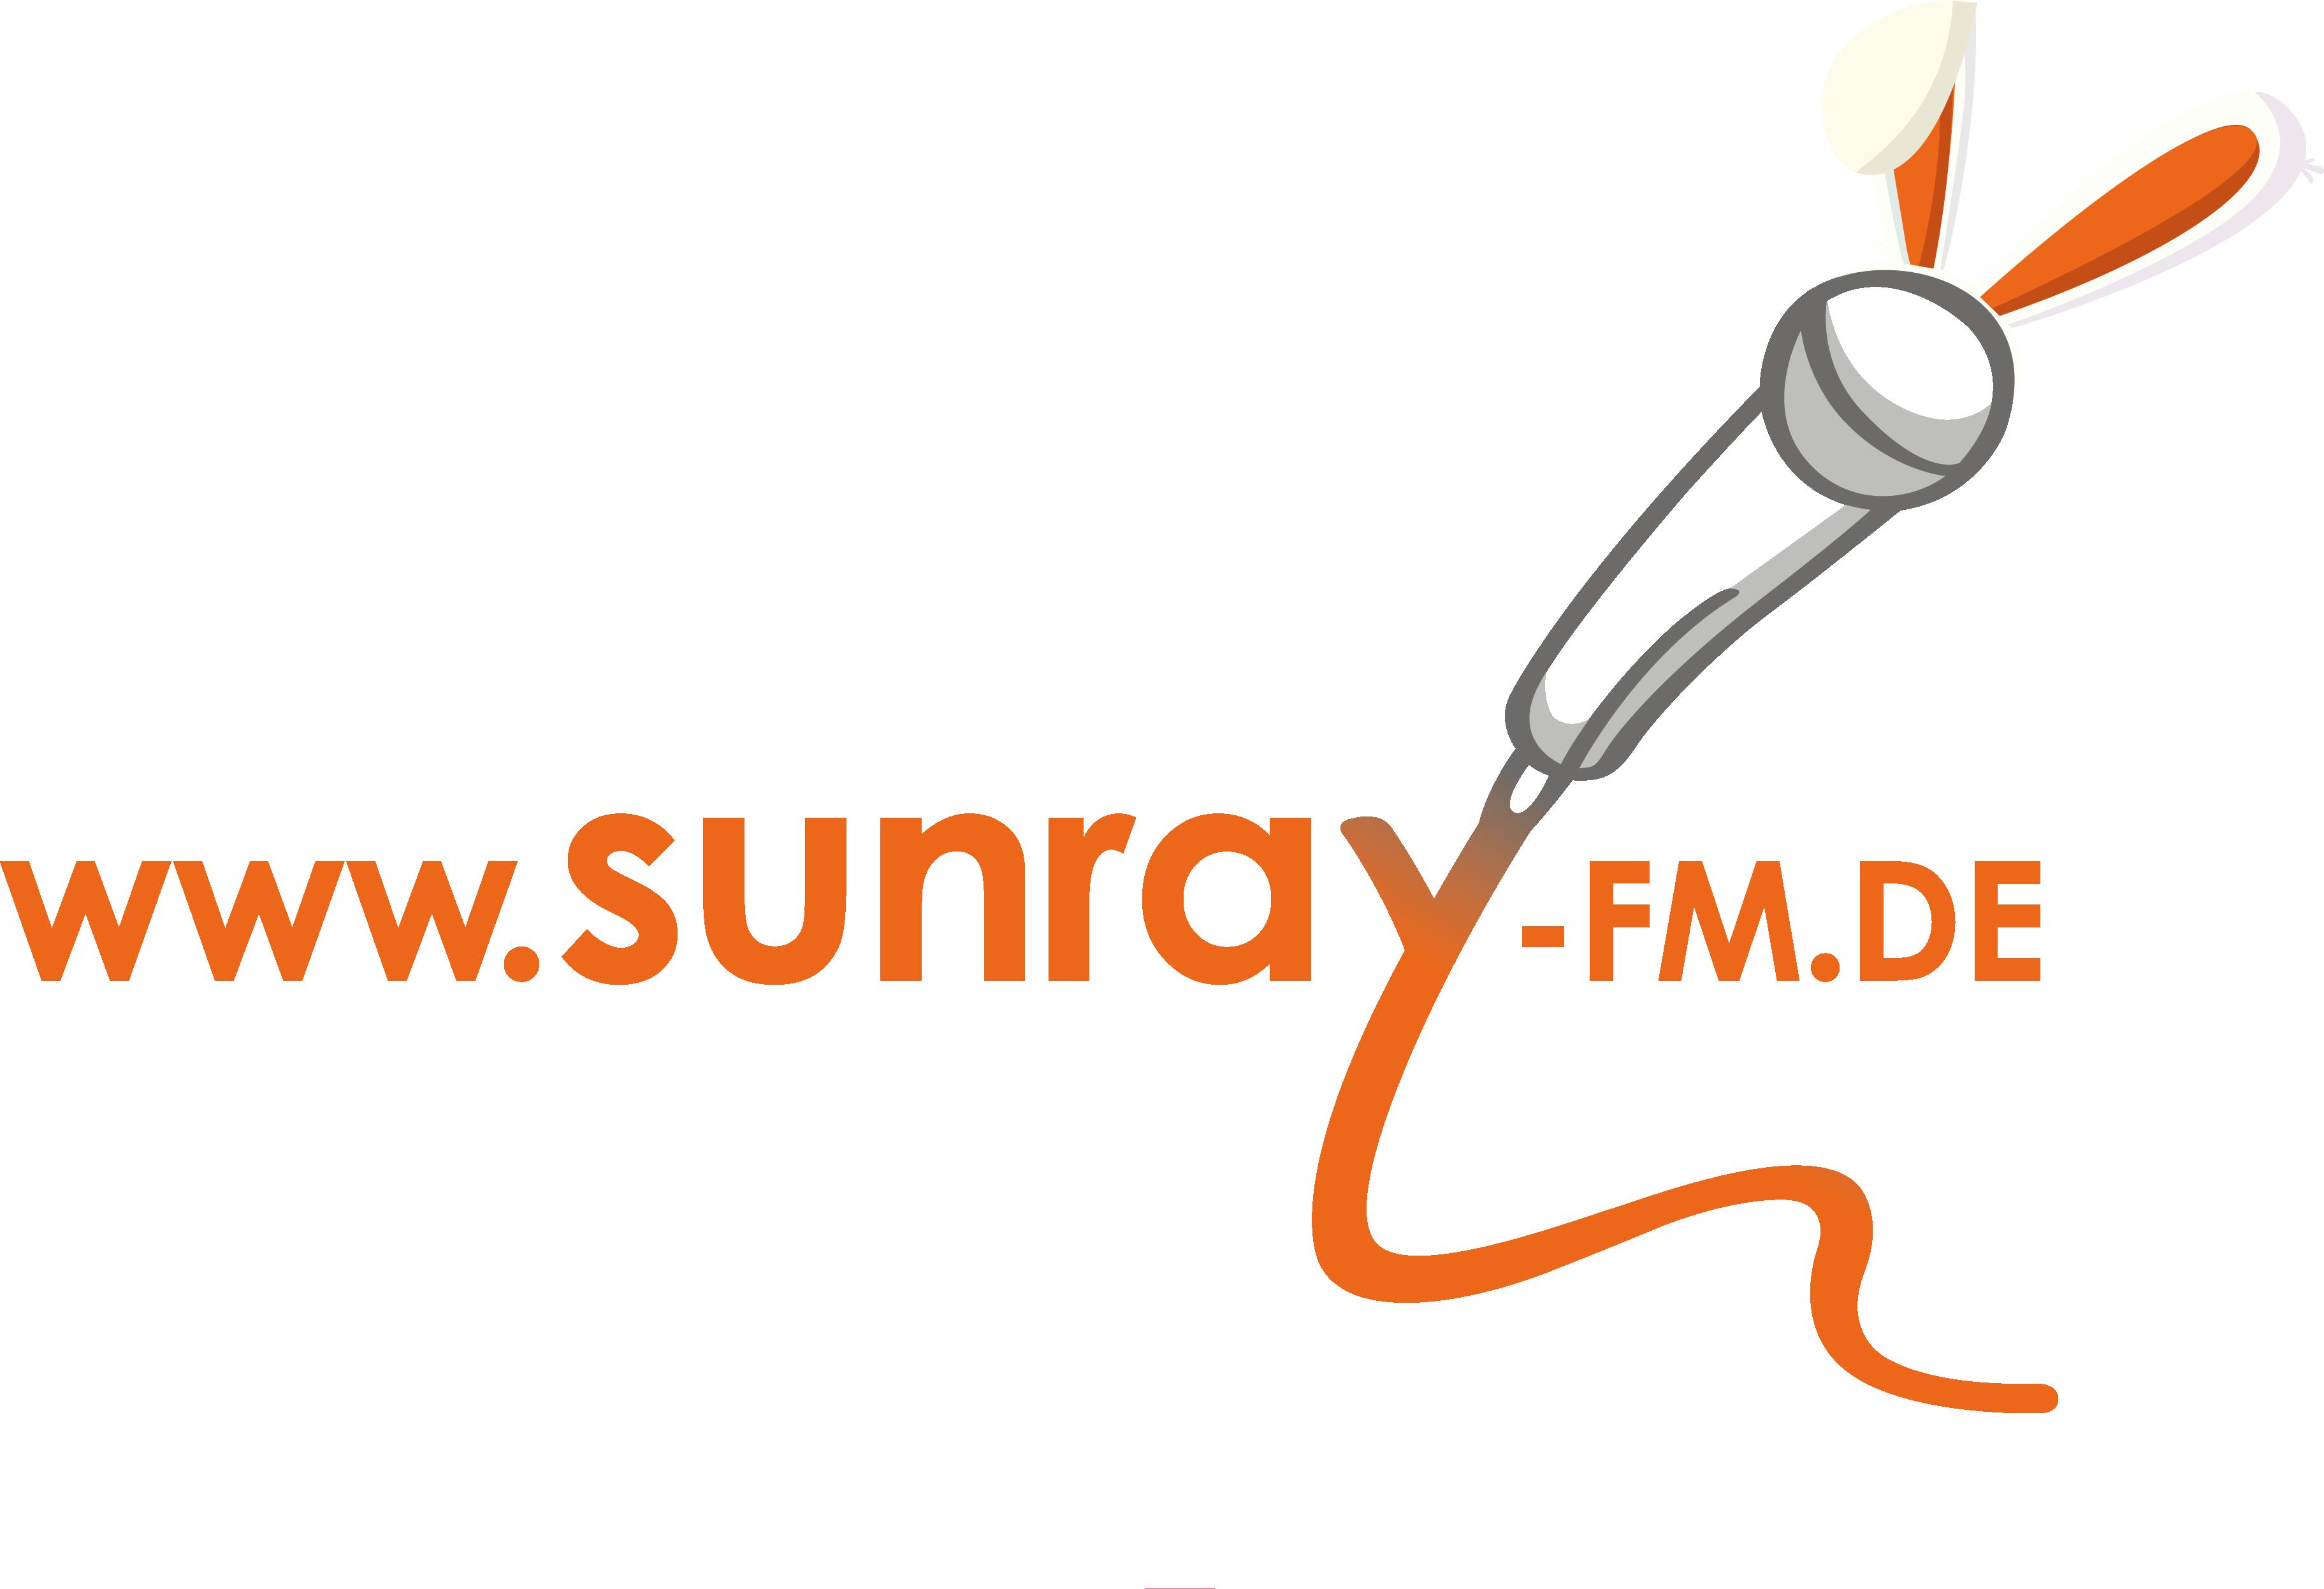 Sunray FM —